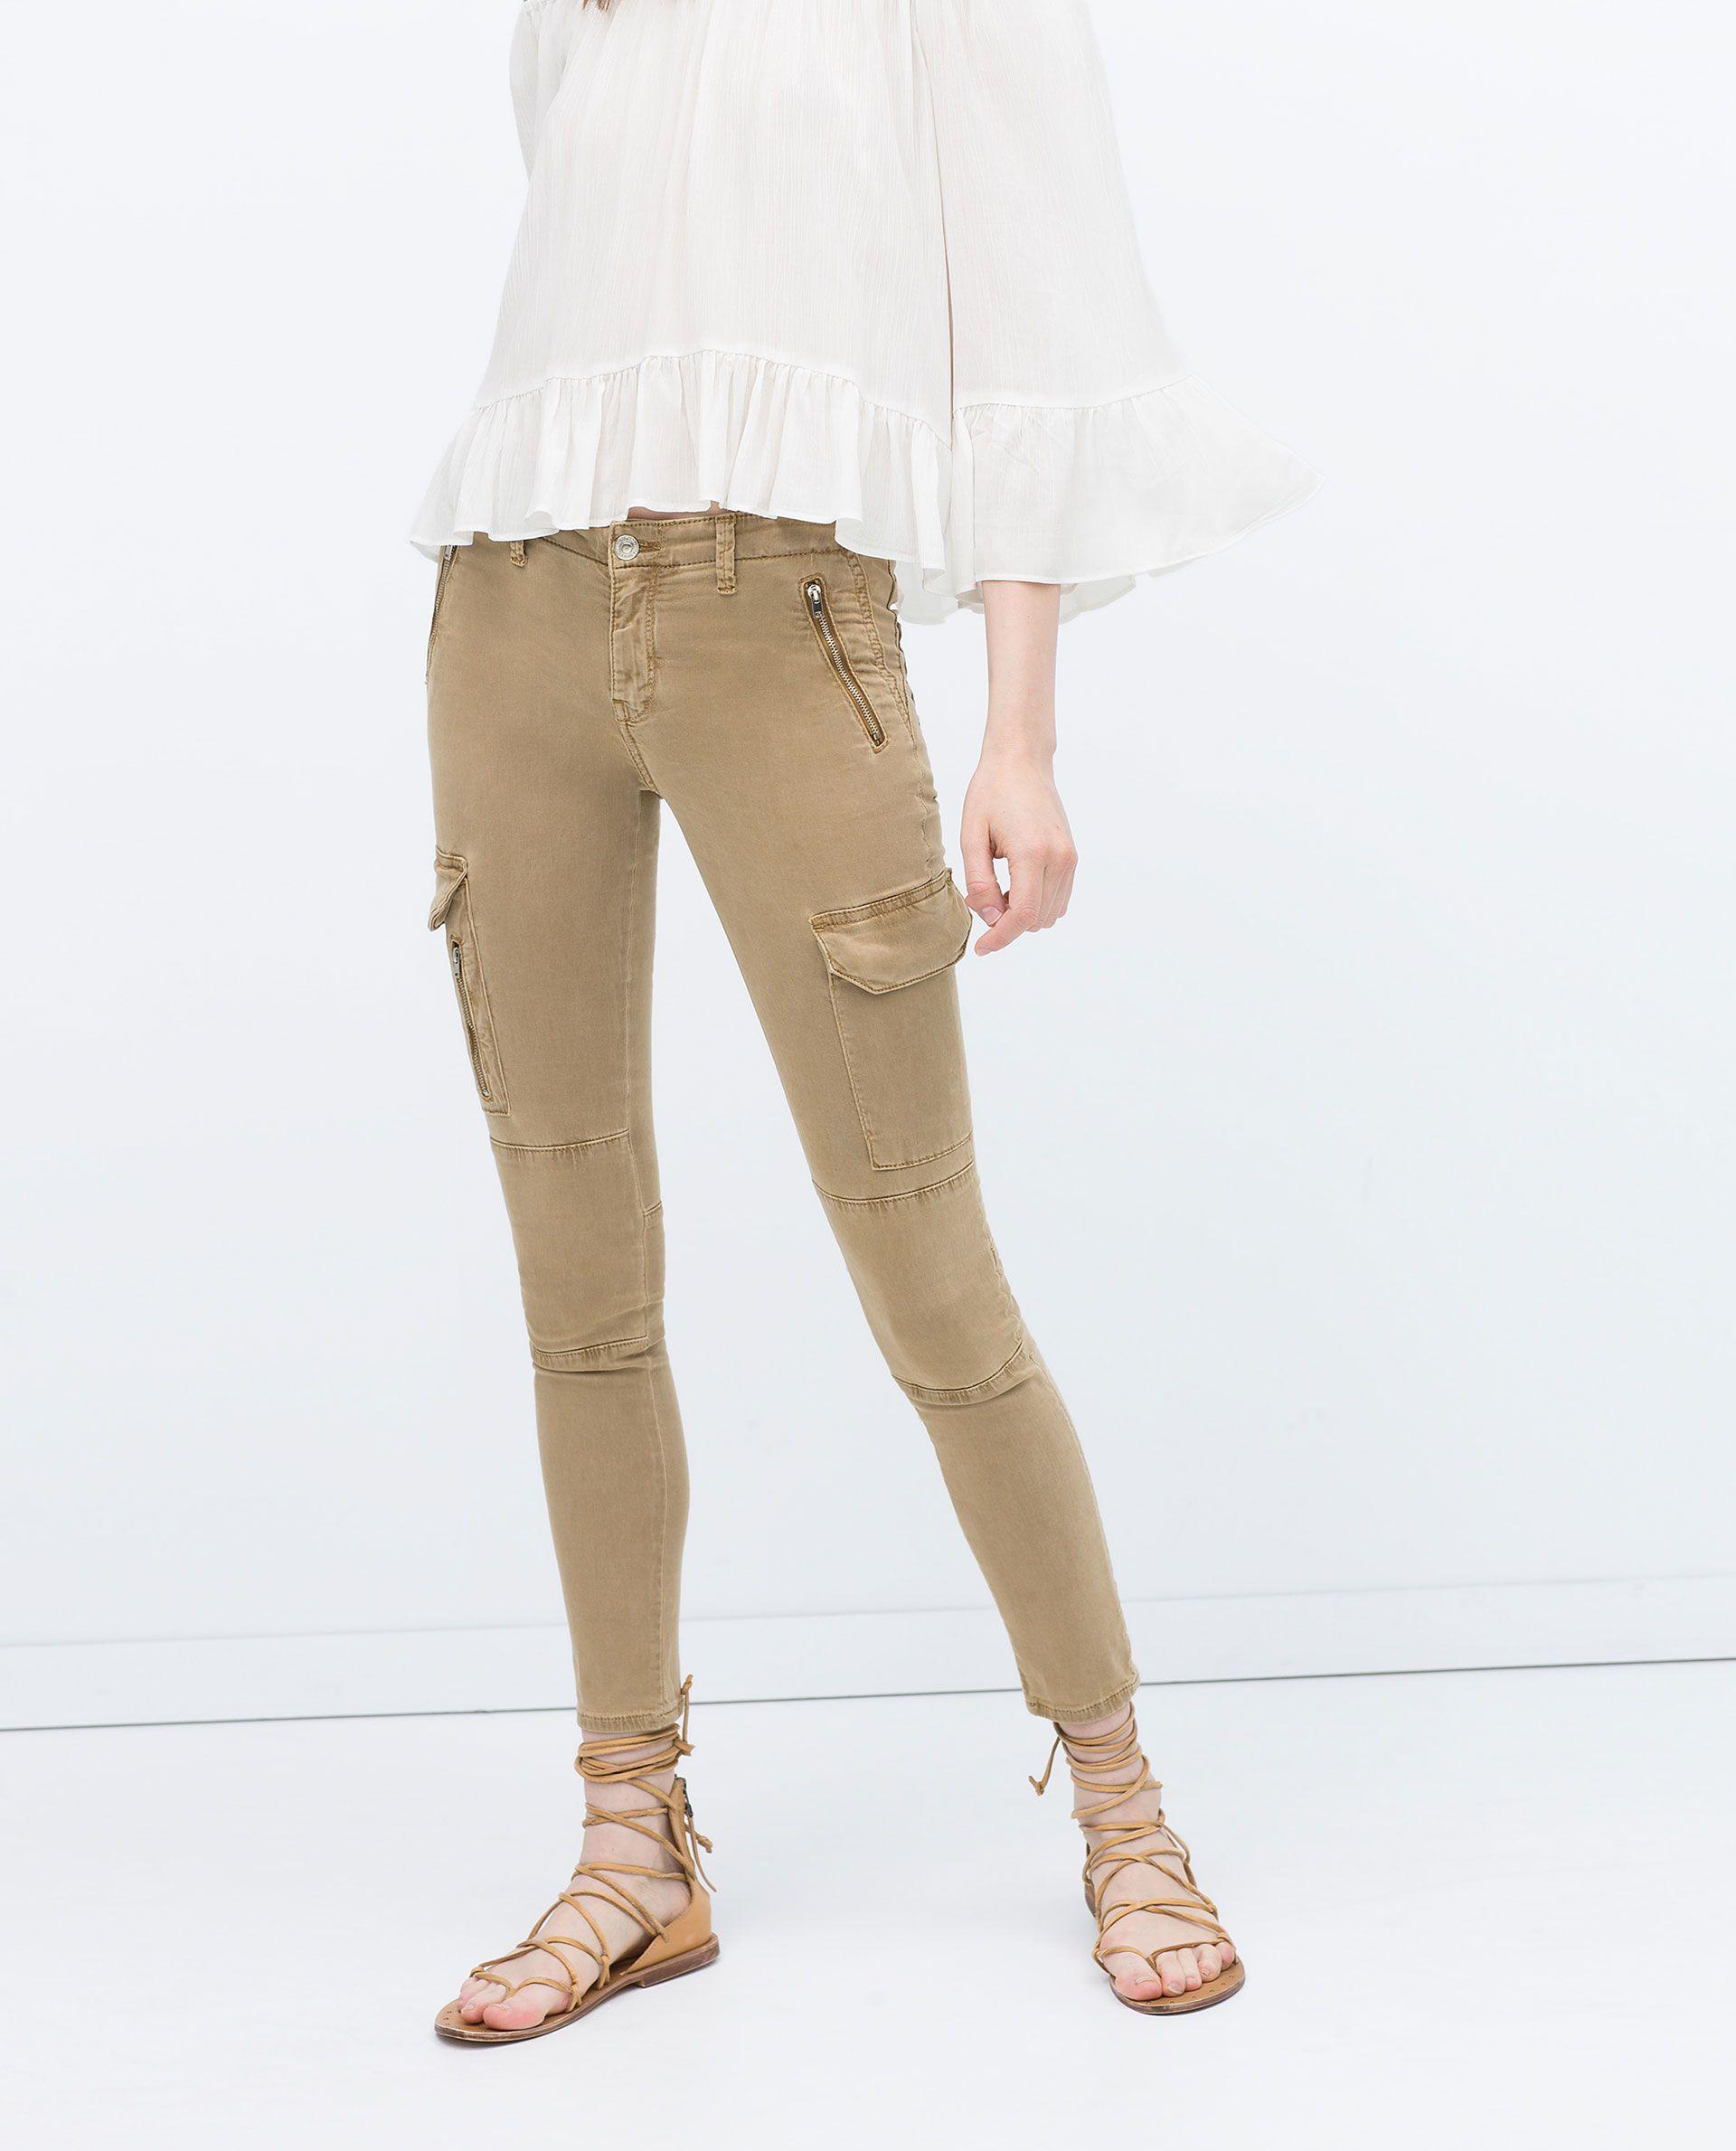 Zbunjeni Konobar Romantika Pantalones Cargo Mujer Zara Thehoneyscript Com